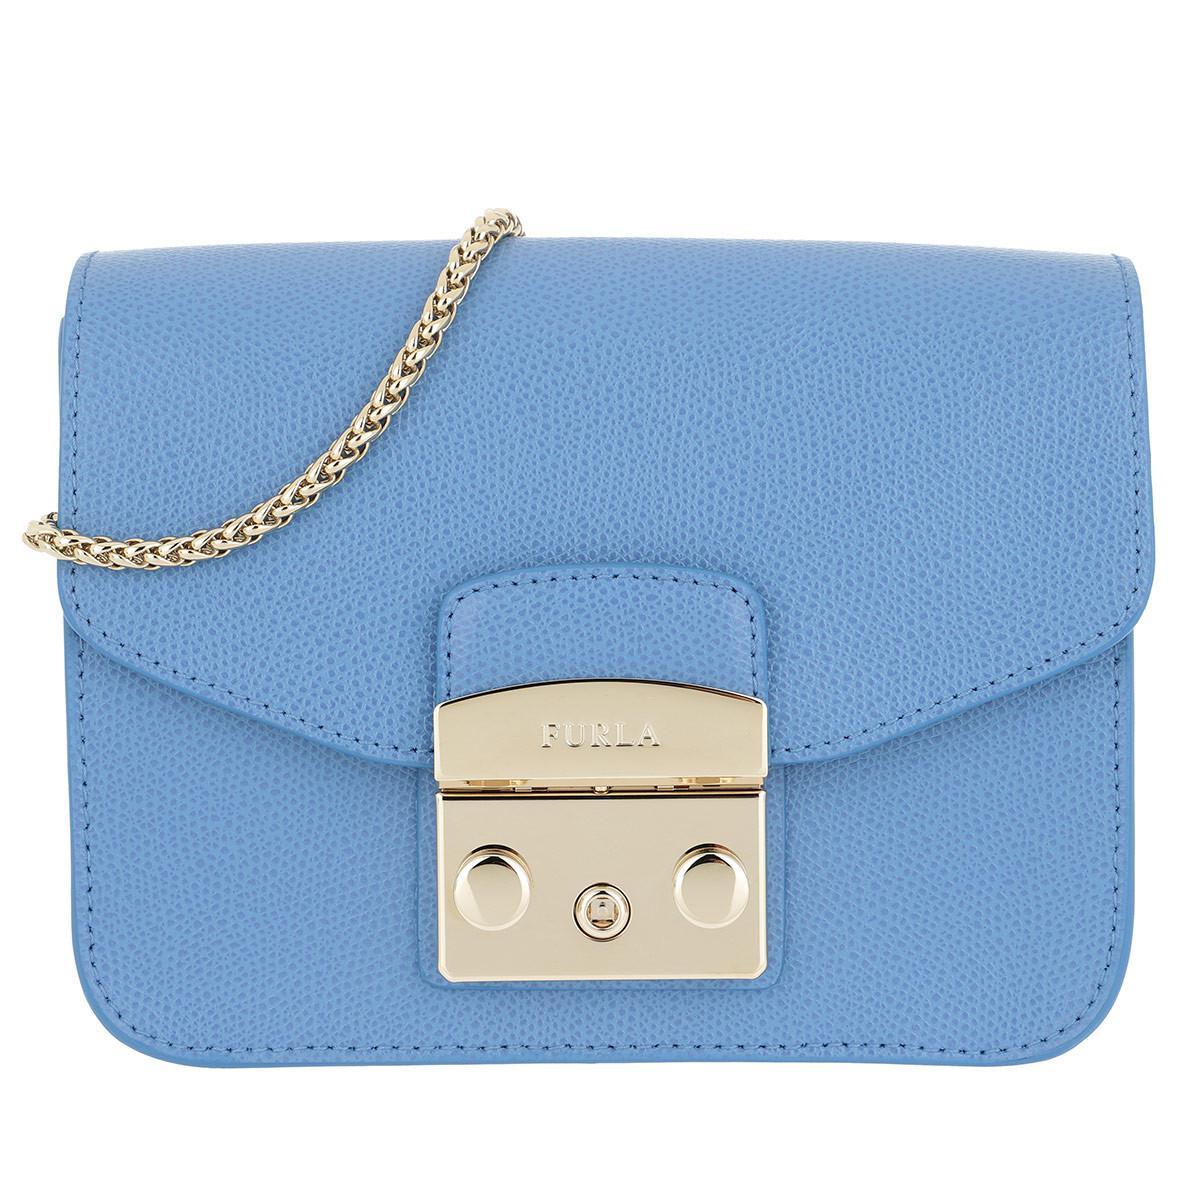 Furla Light blue Metropolis bag in printed leather qQxx6pRqxb